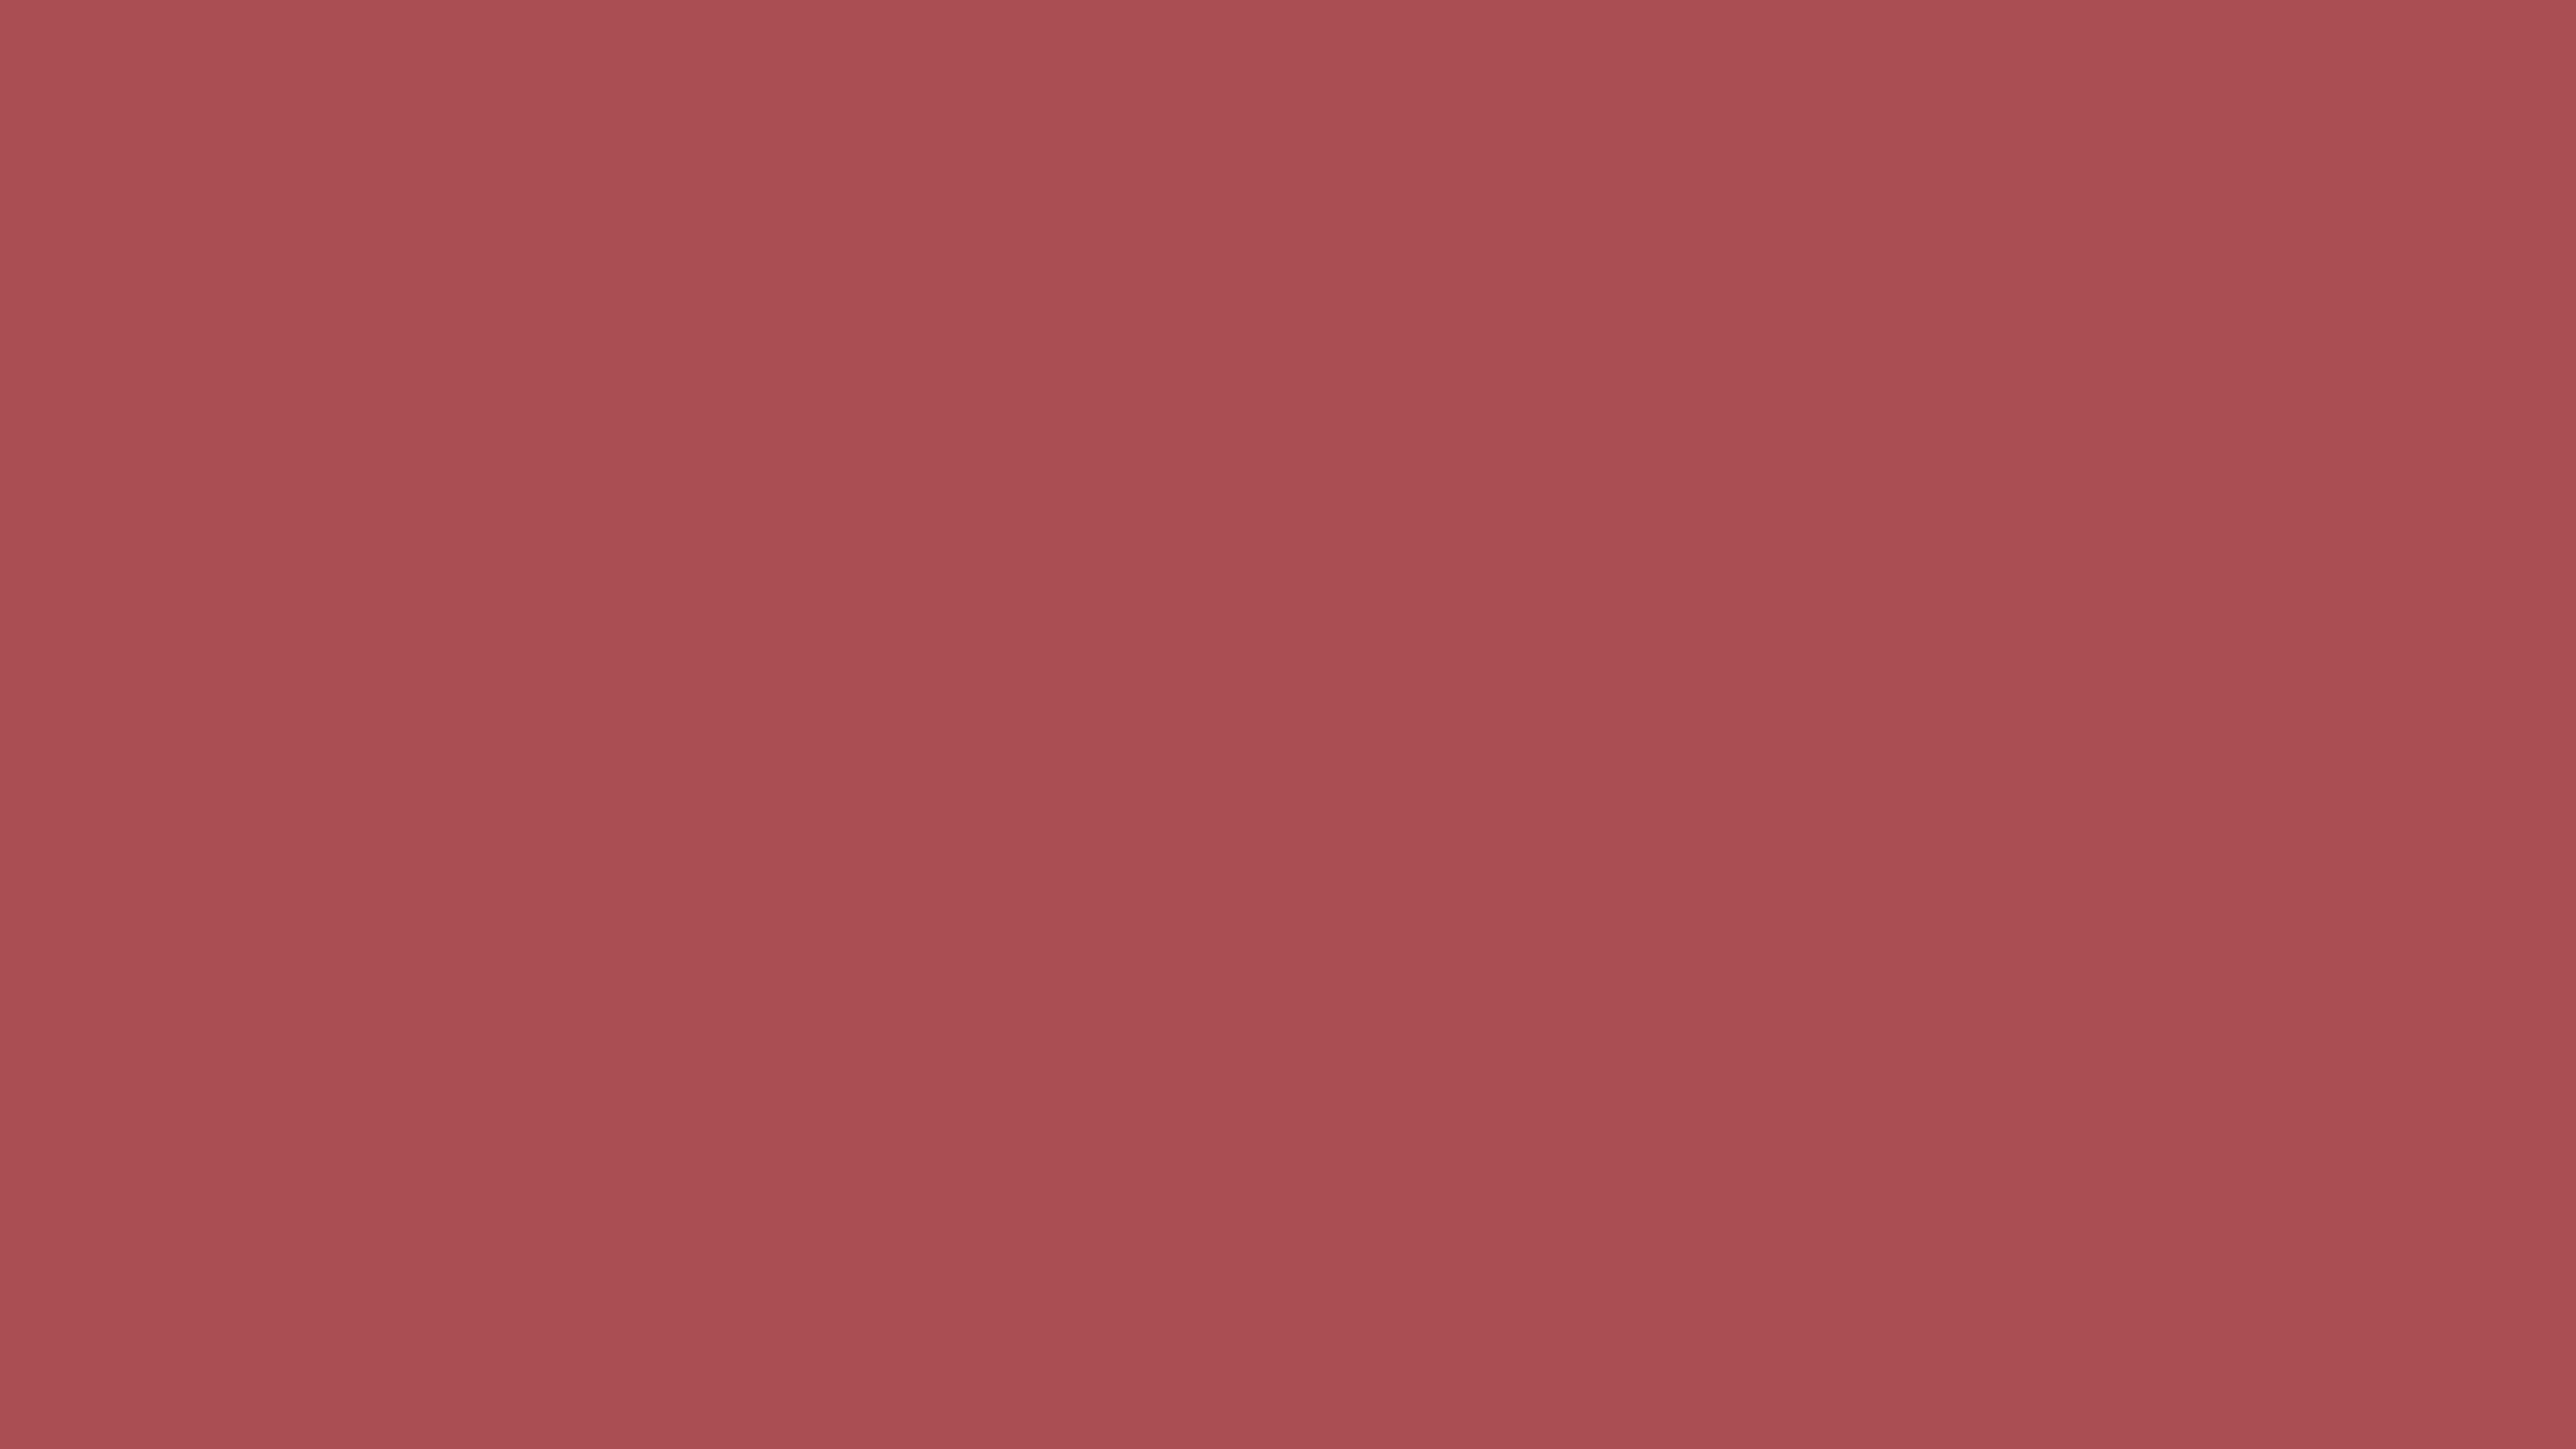 5120x2880 Rose Vale Solid Color Background